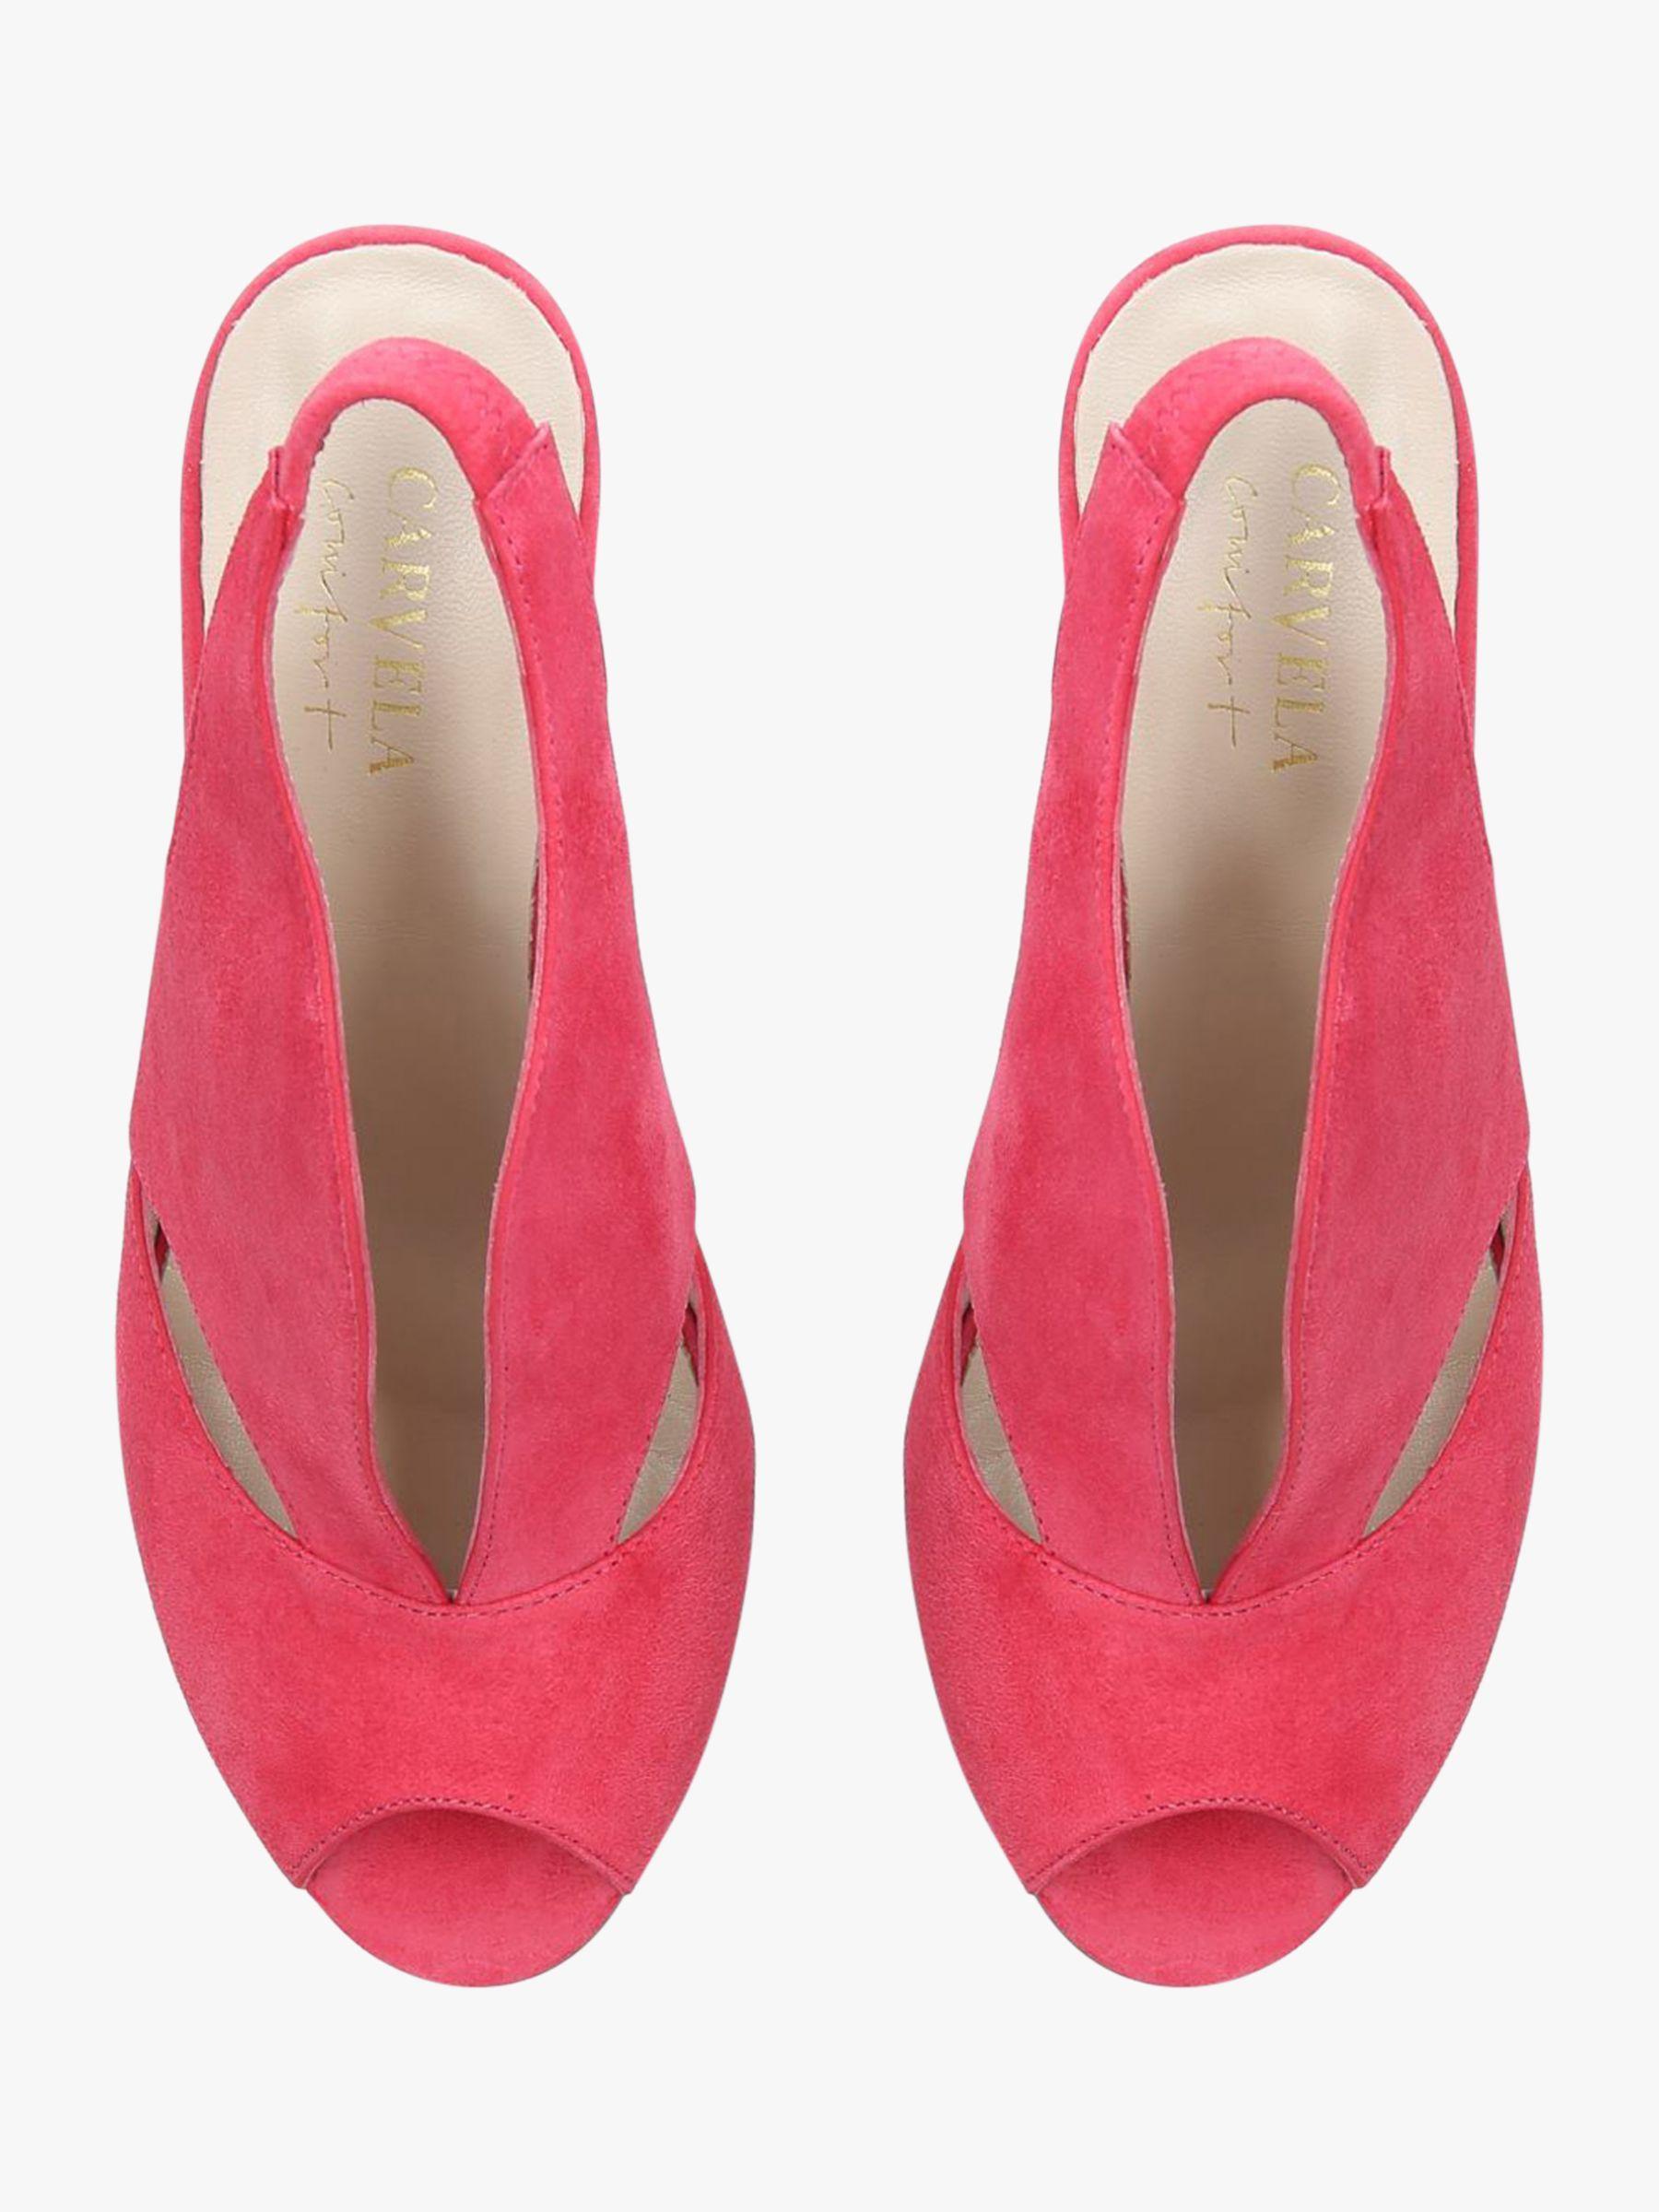 ff52fa36e3 Carvela Kurt Geiger Arabella Cone Heel Open Toe Court Shoes in Pink - Lyst